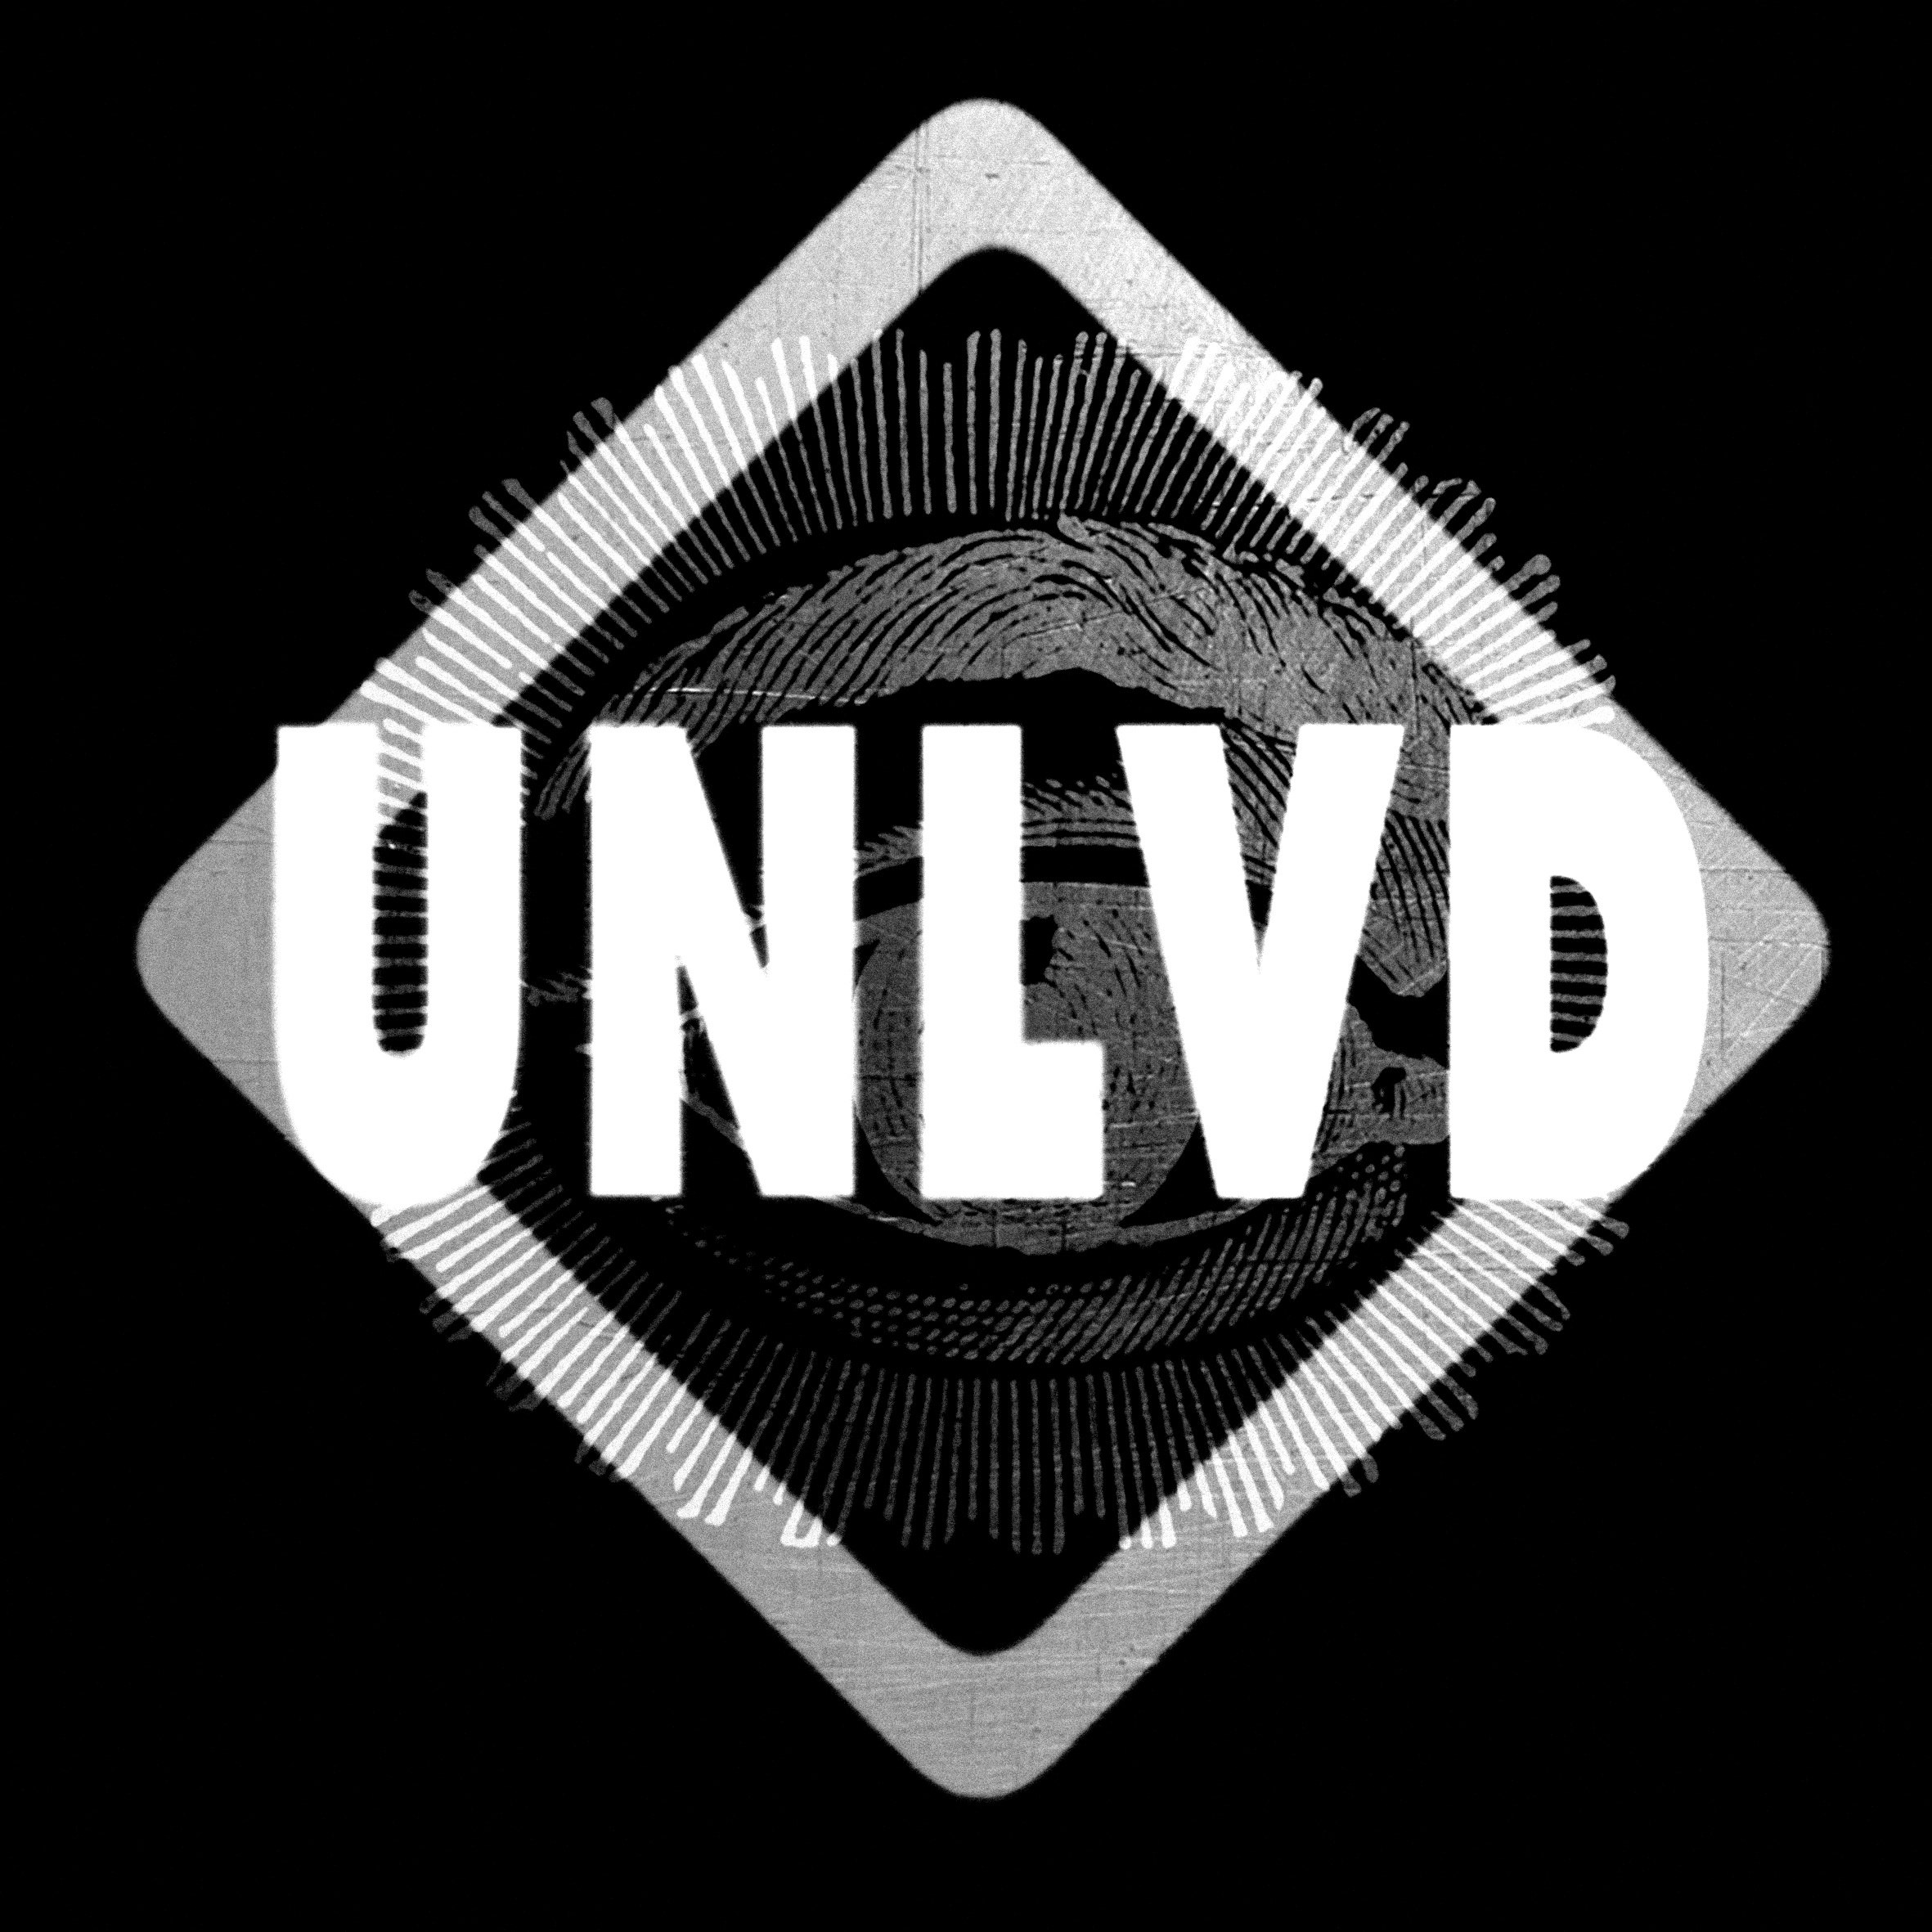 Ulvd logo bwlrg